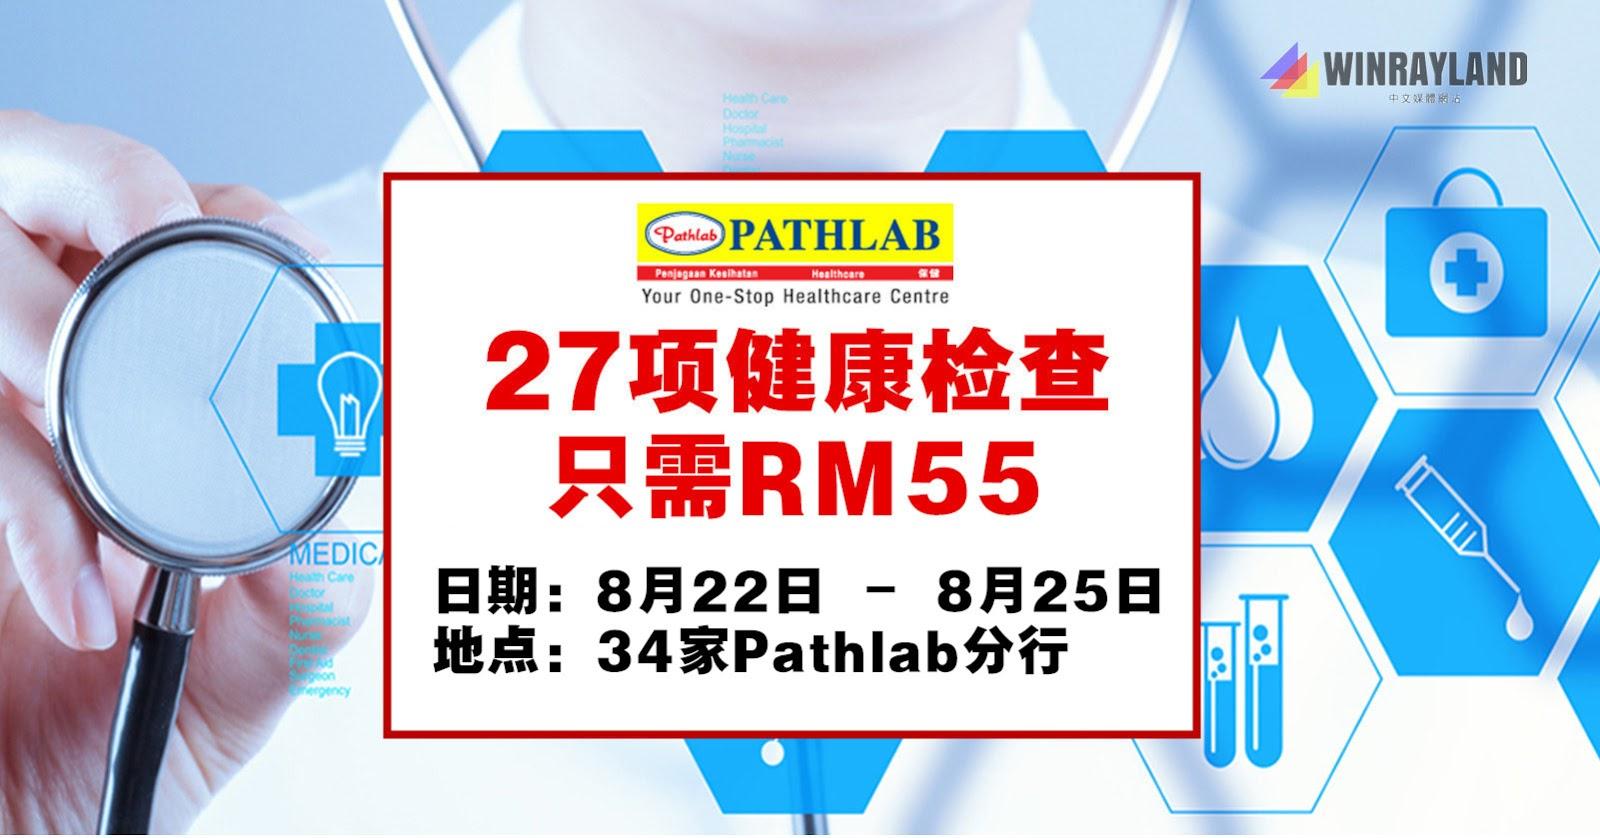 Pathlab身体检查优惠,最低只需RM55